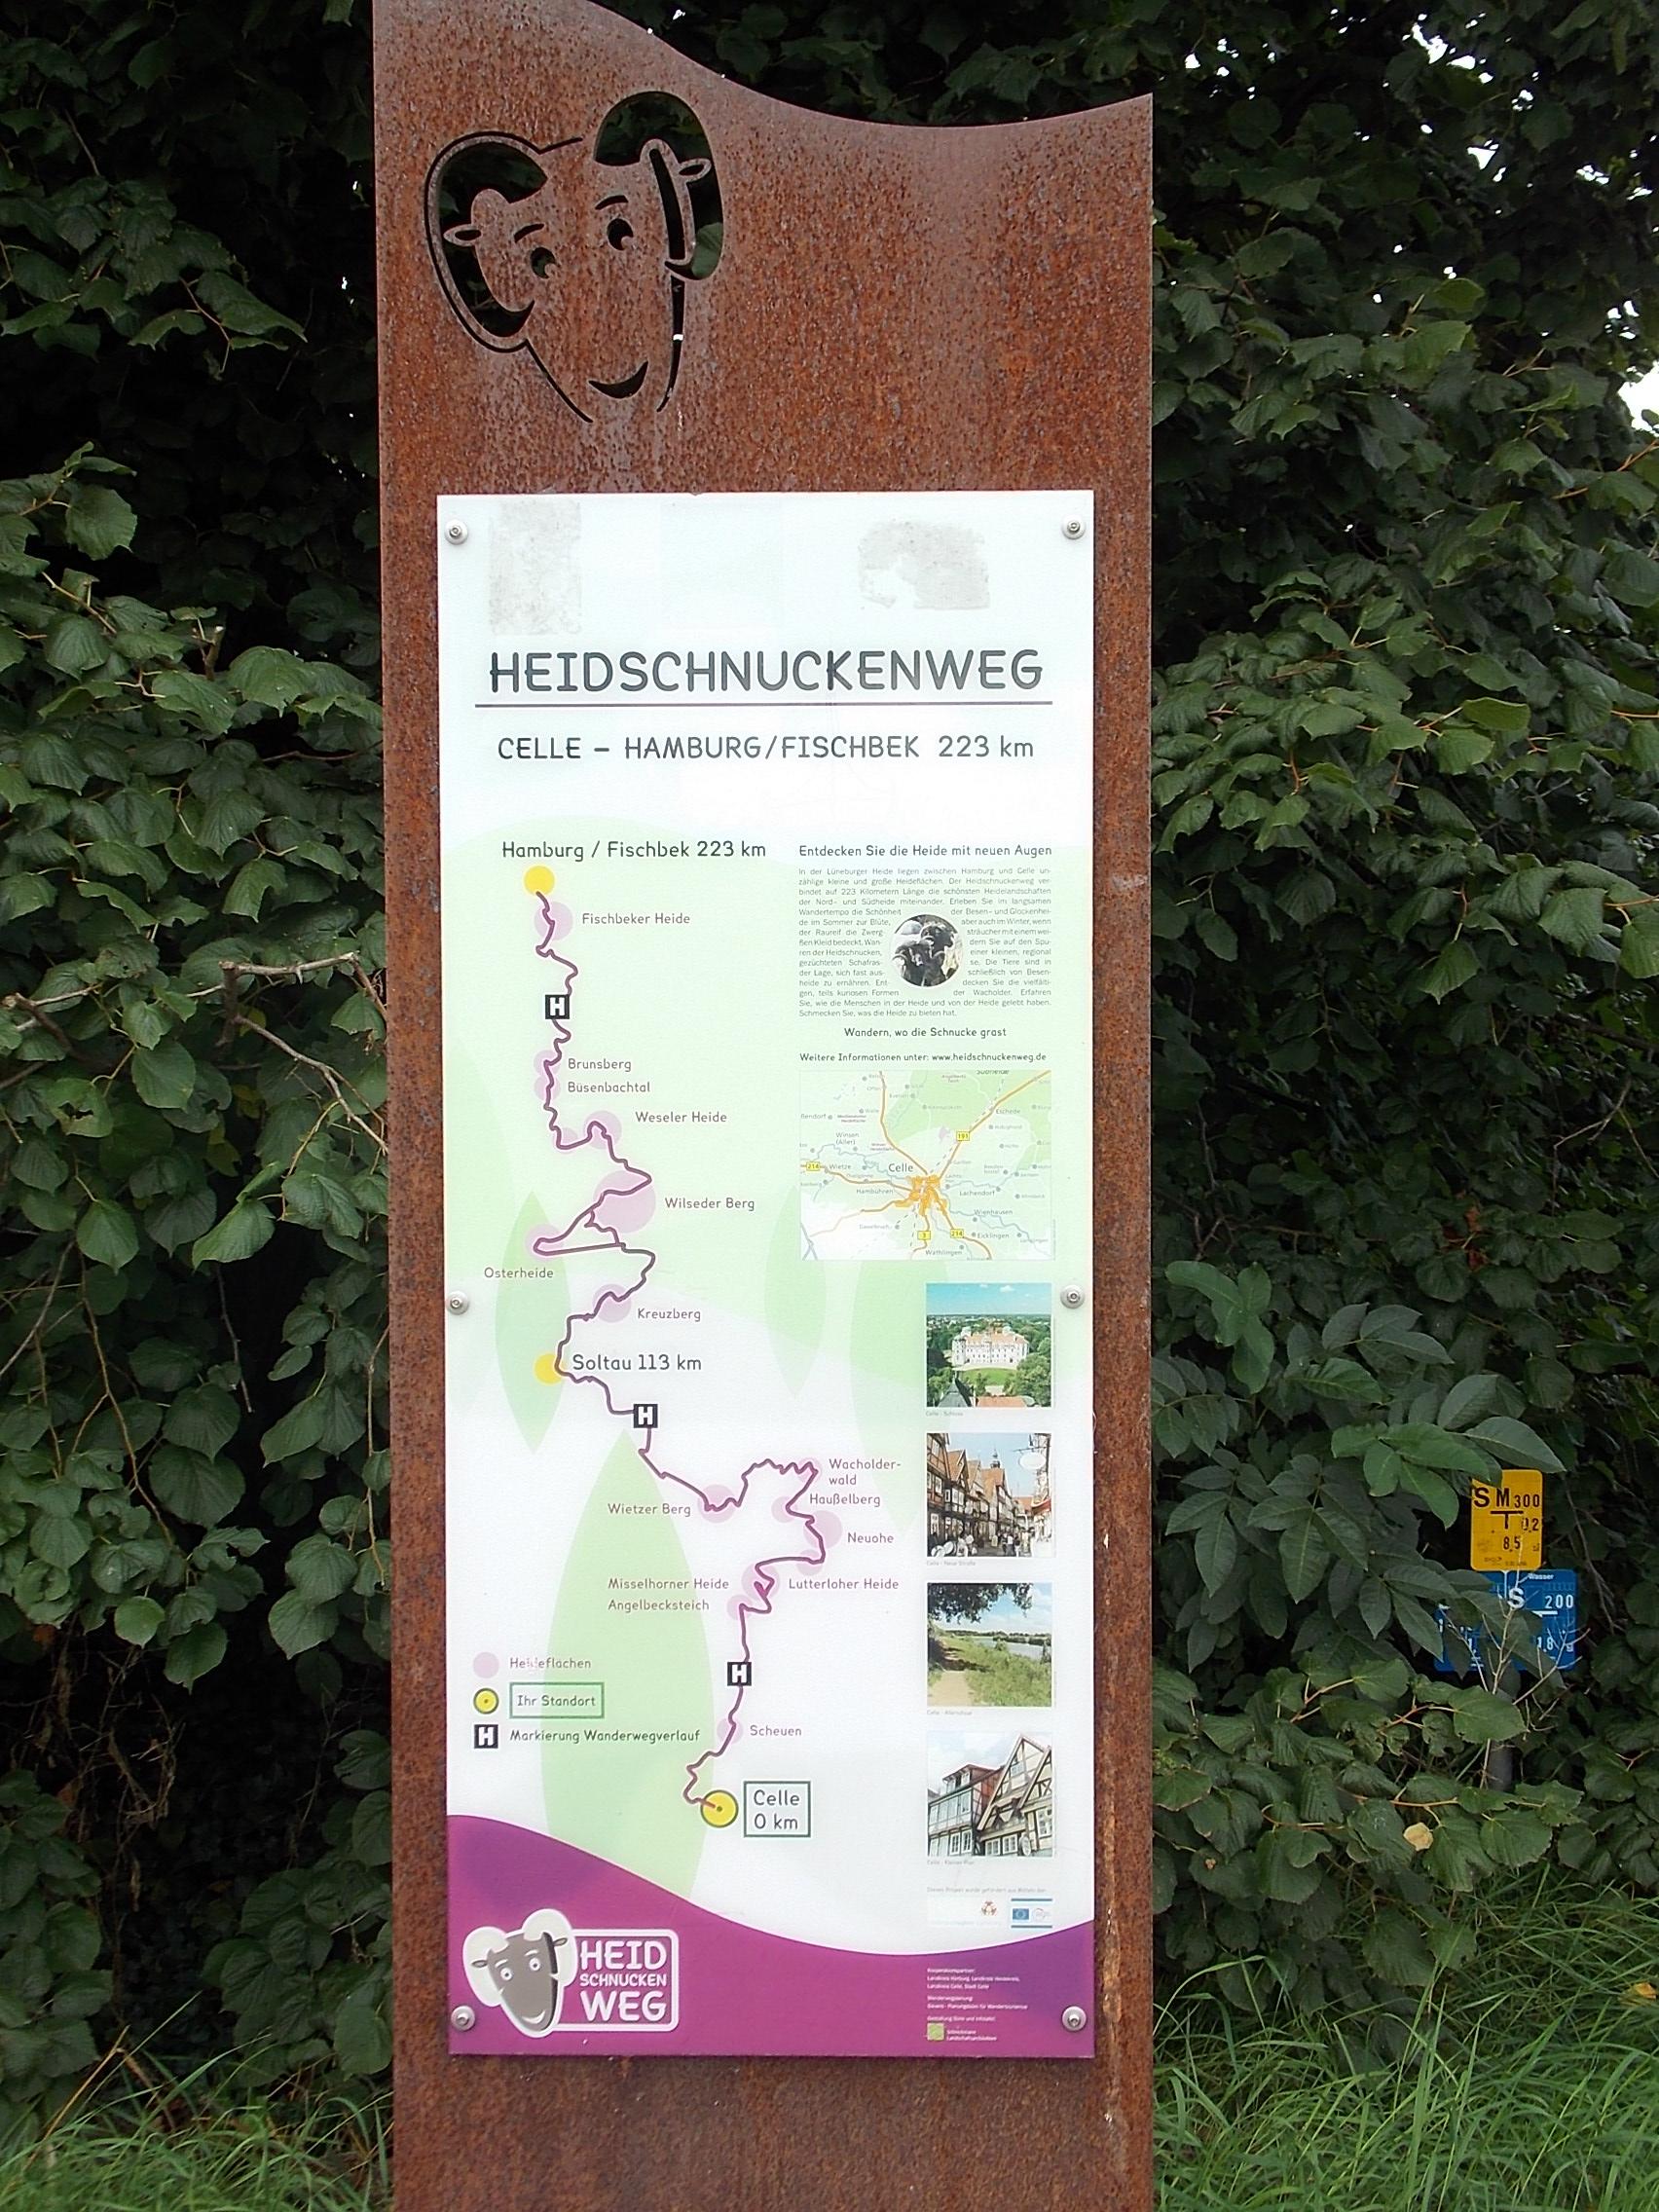 Celle Heidschnuckenweg